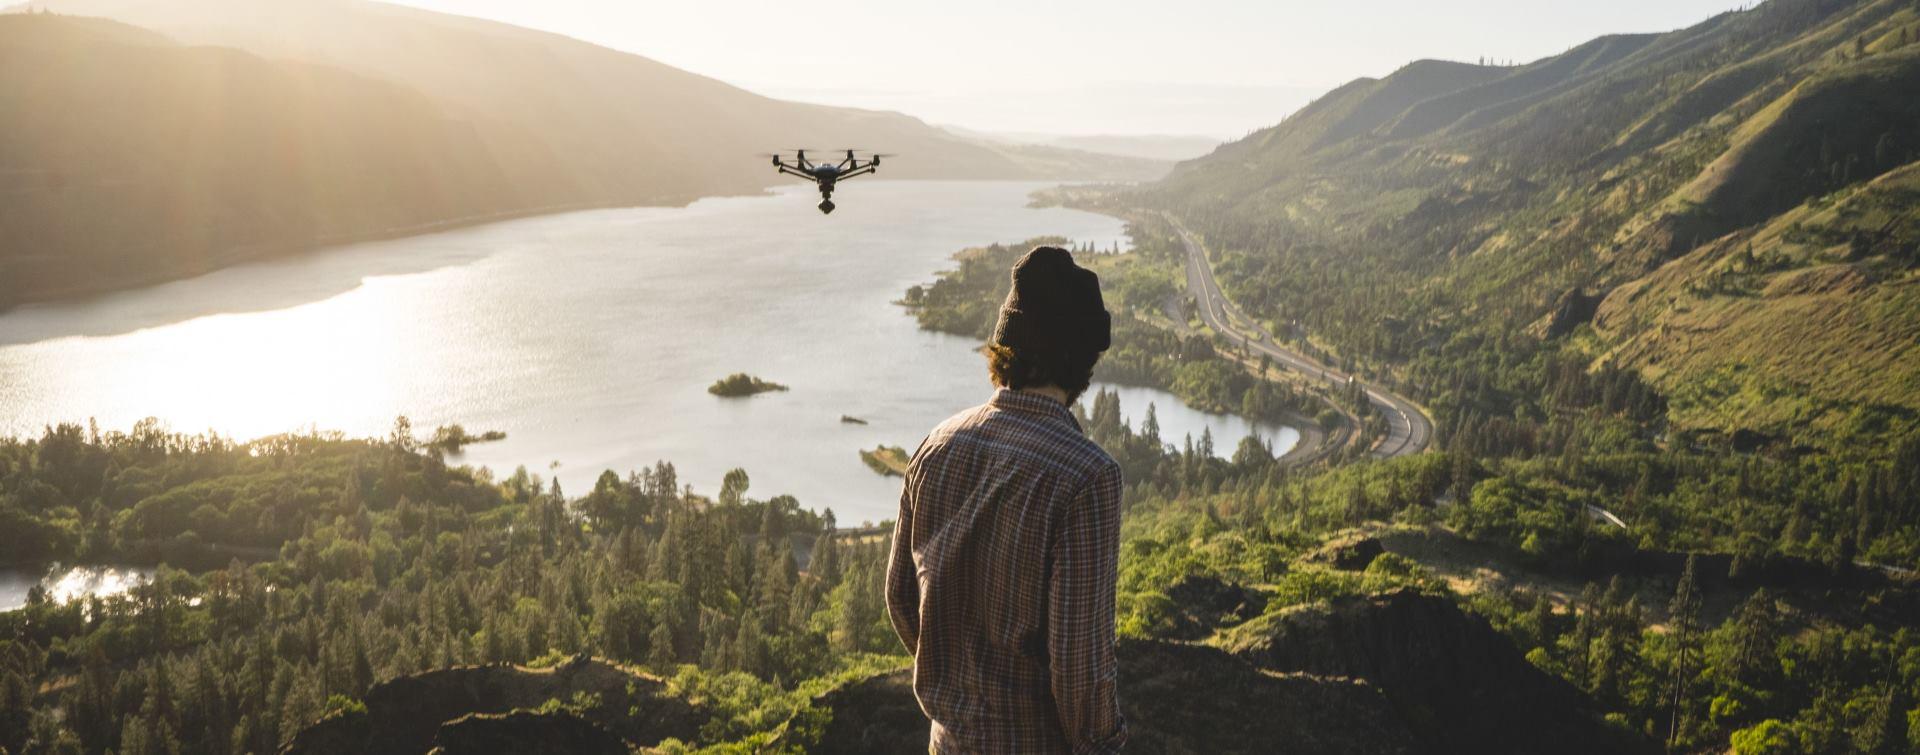 VIDEO: Proučimo dron za spasilačke situacije